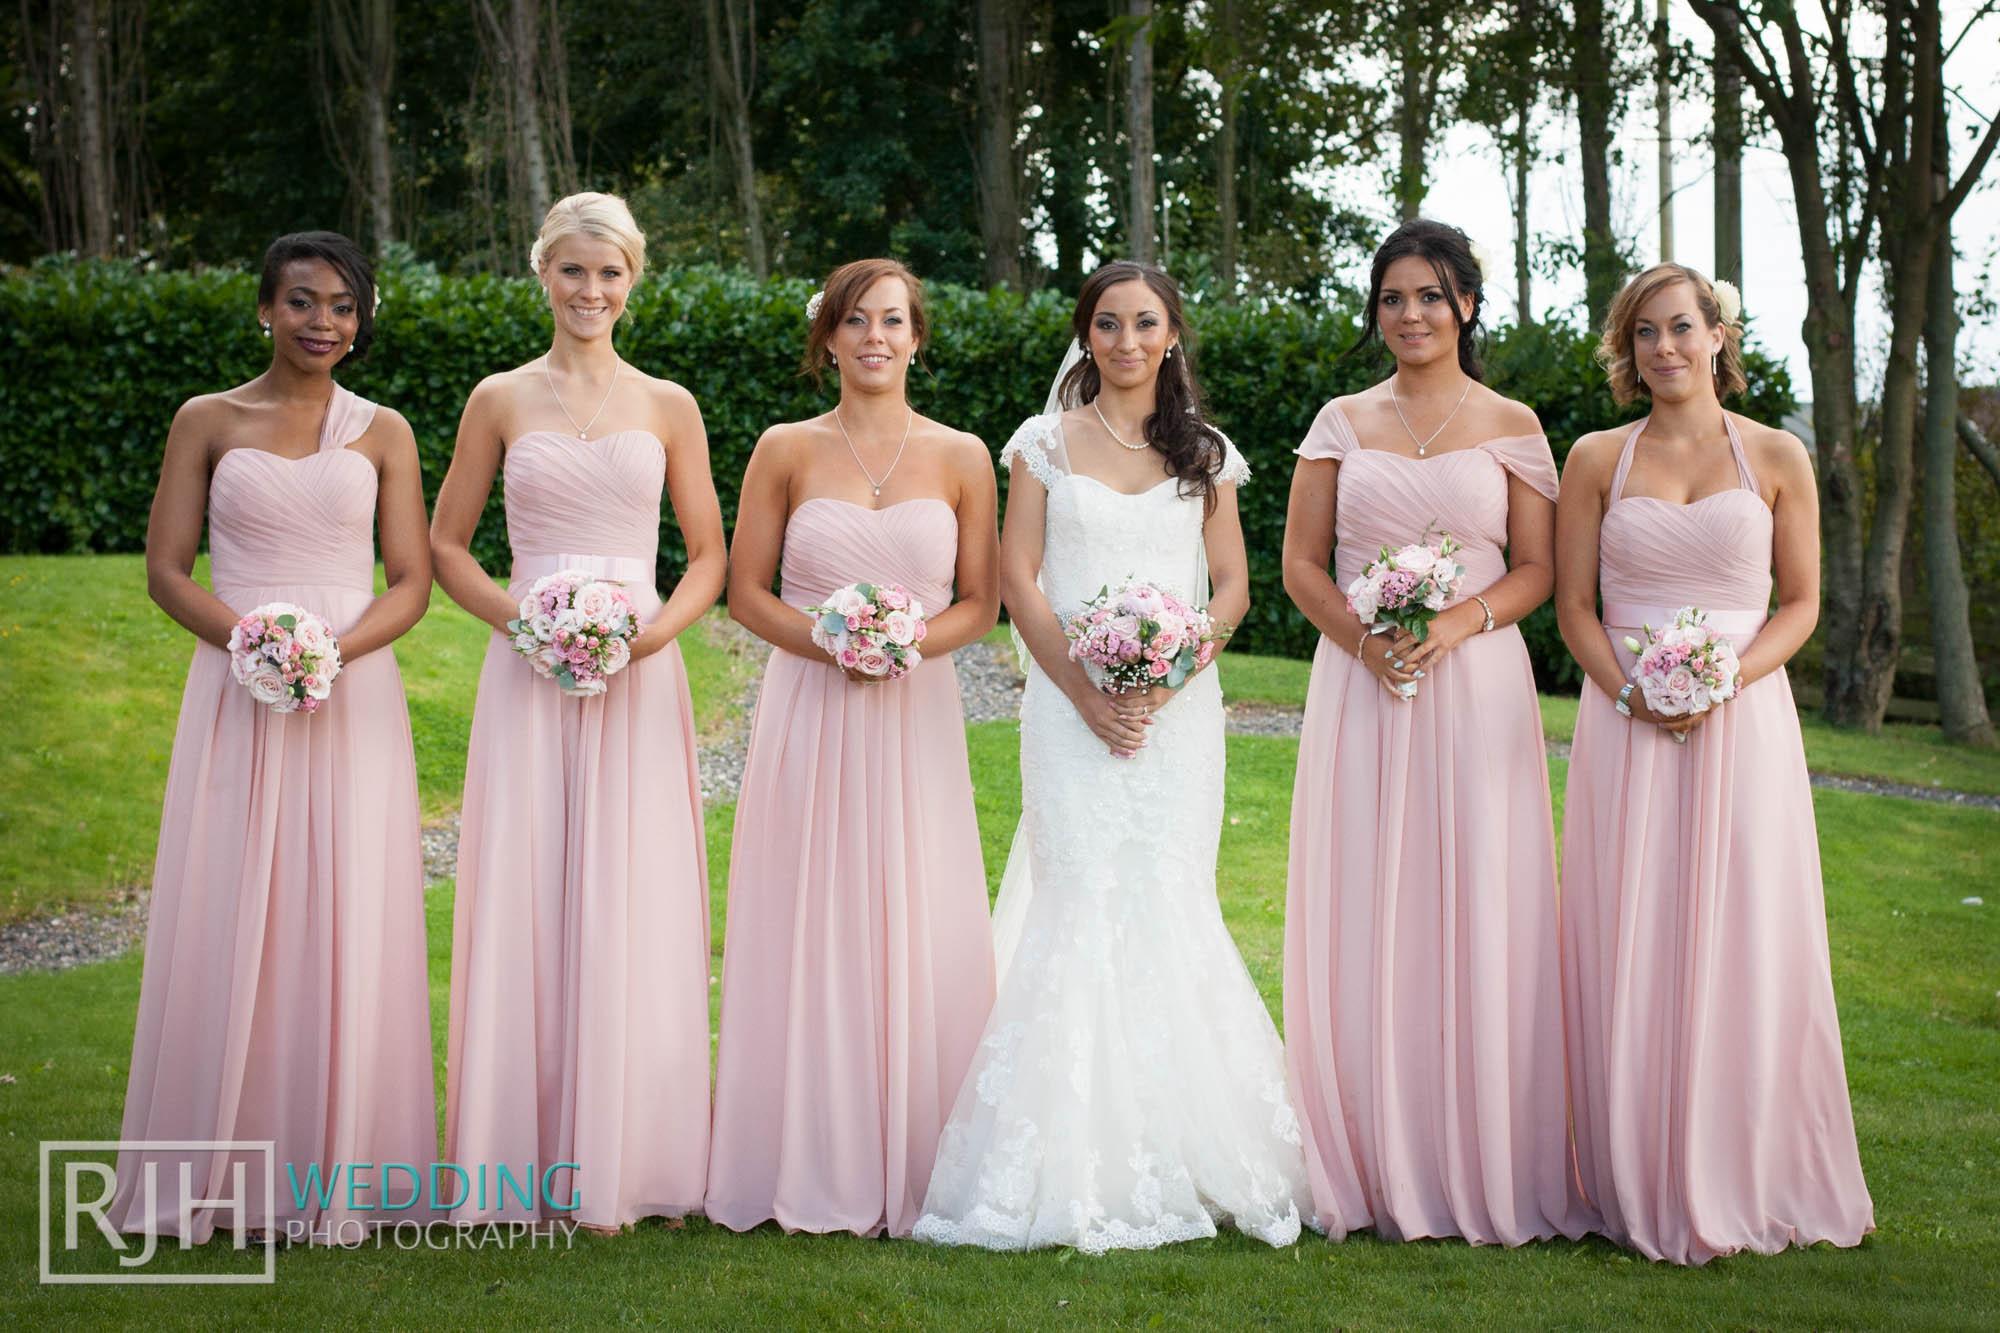 RJH Wedding Photography_Tankersley Manor Wedding_33.jpg